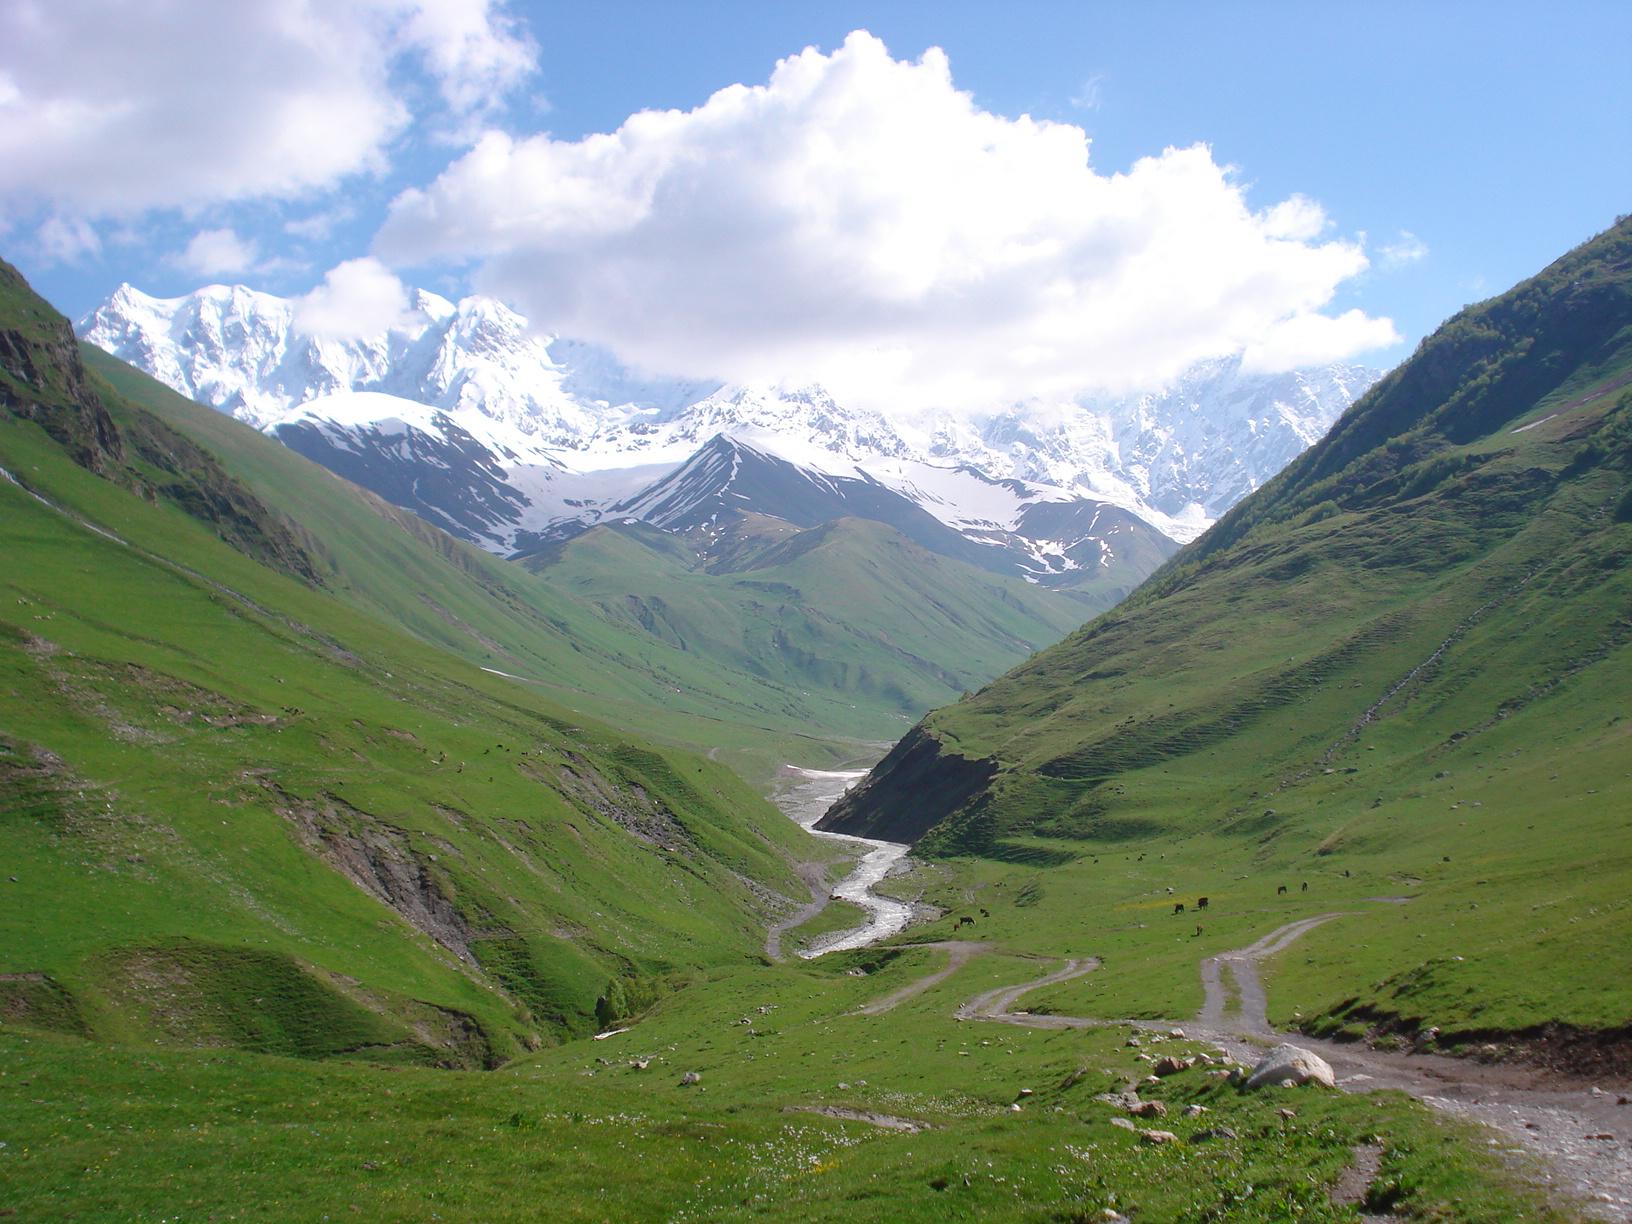 Upper Svaneti region of Georgia (hiking towards Mount Shkhara highest mountain in Georgia at 17,100 ft)